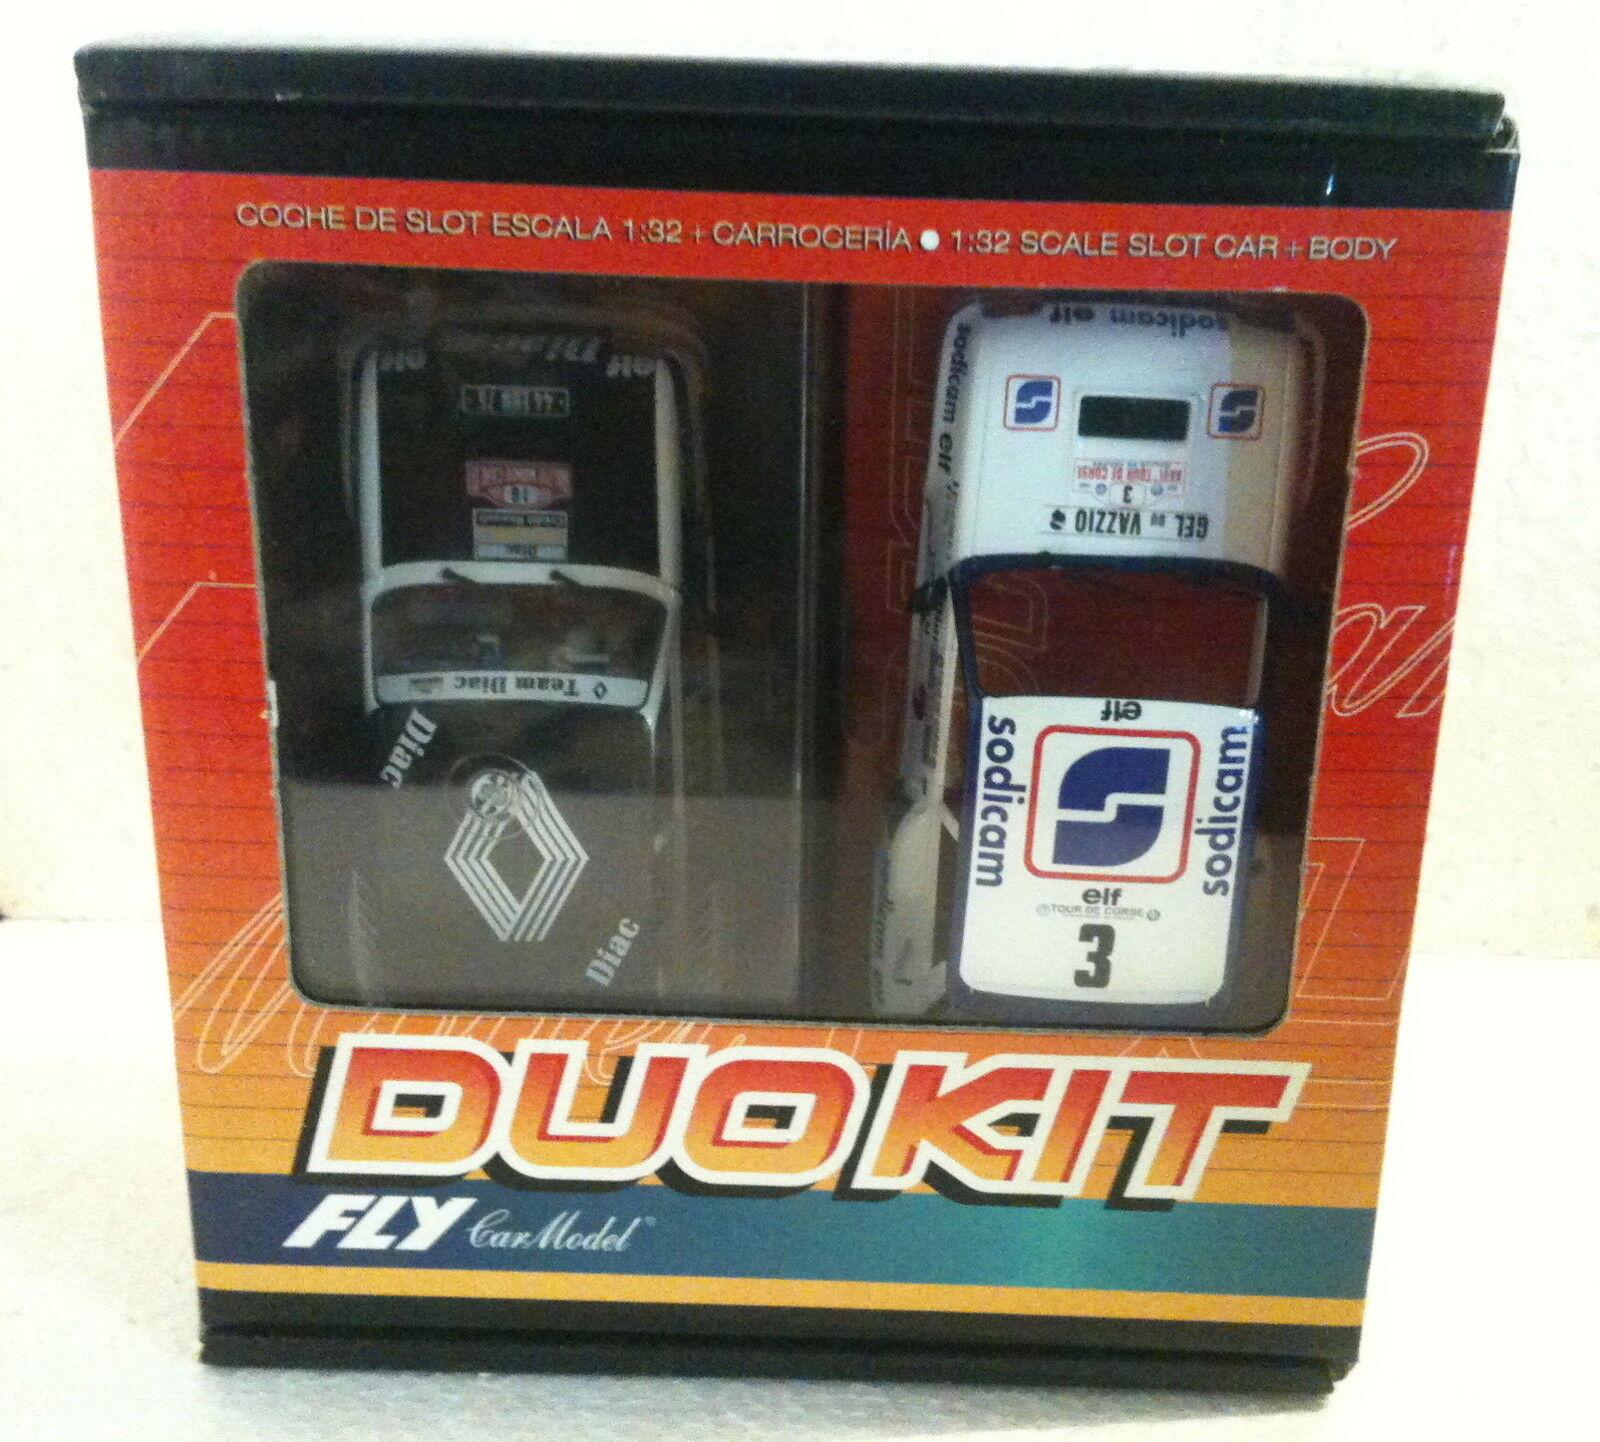 QQ 88296 Fly Duo Kit R 5 Turbo Diac R Montecarlo  16 Körper Sodicam Tour De Corse